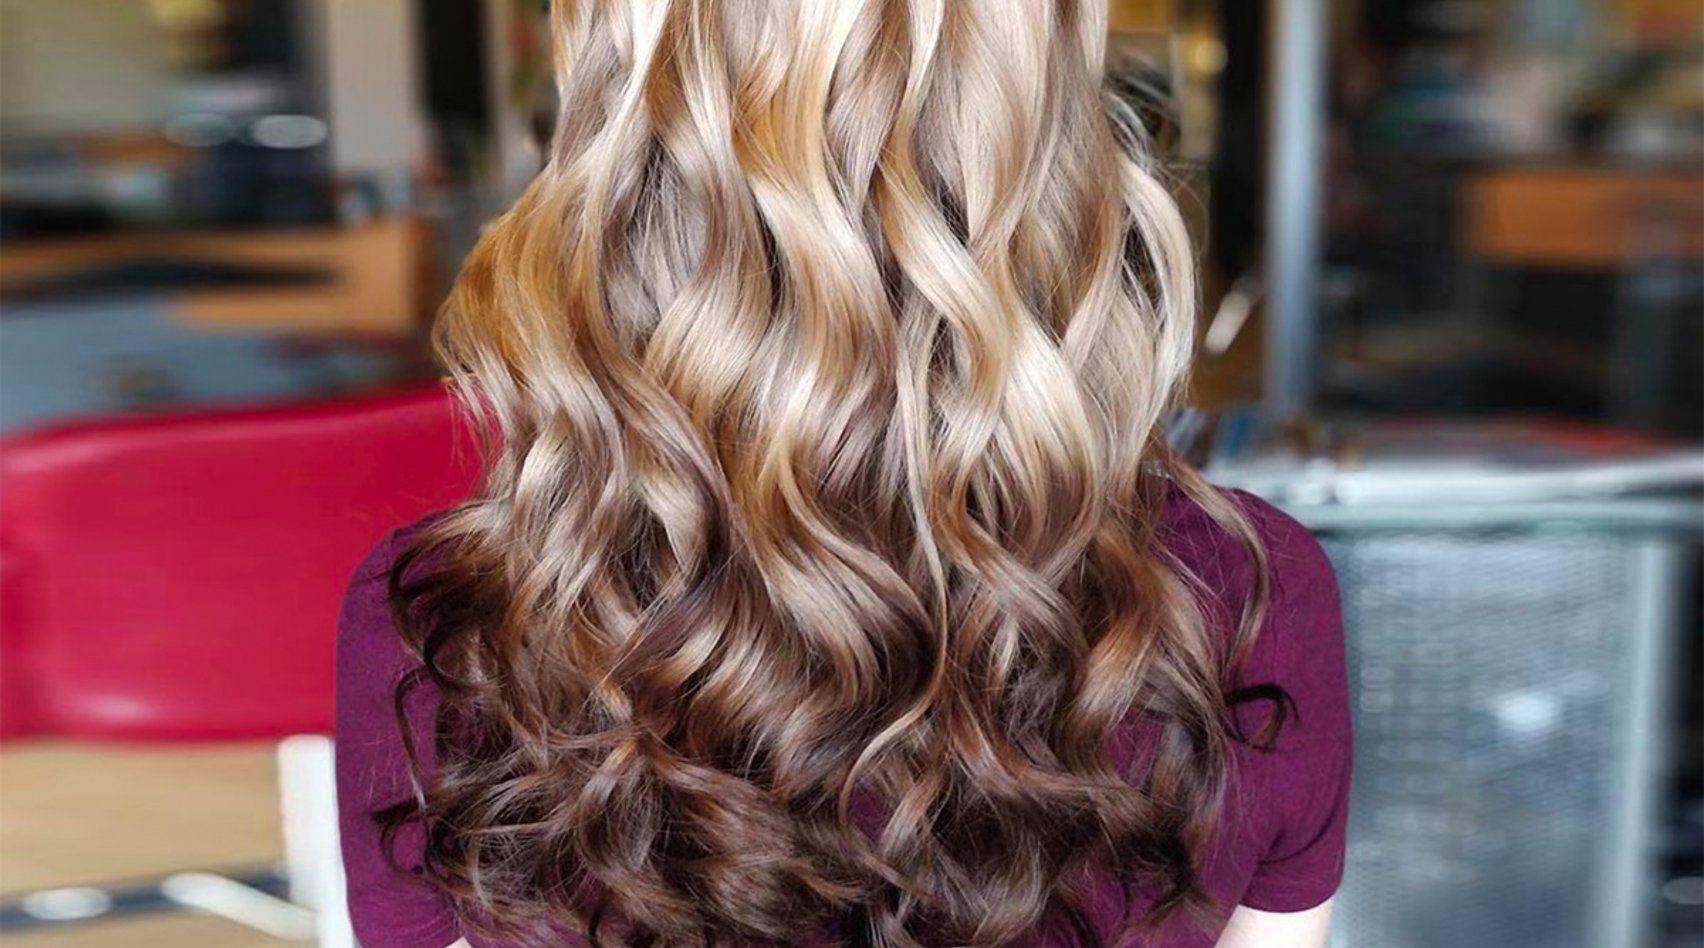 Haarfarben oben dunkel unten hell - Pony frisur